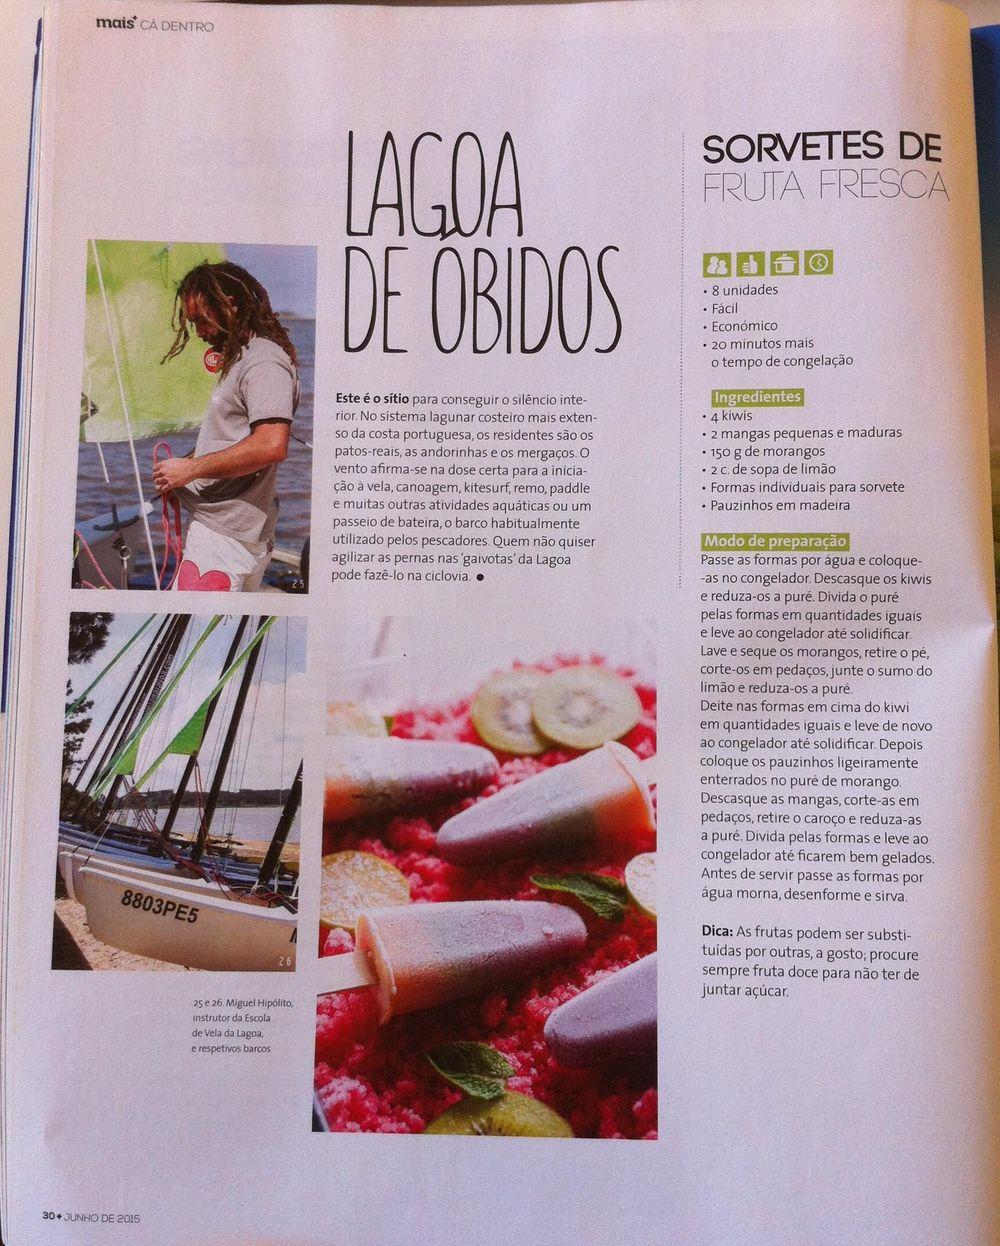 Food/Lifestyle Magazine - image 1 - student project